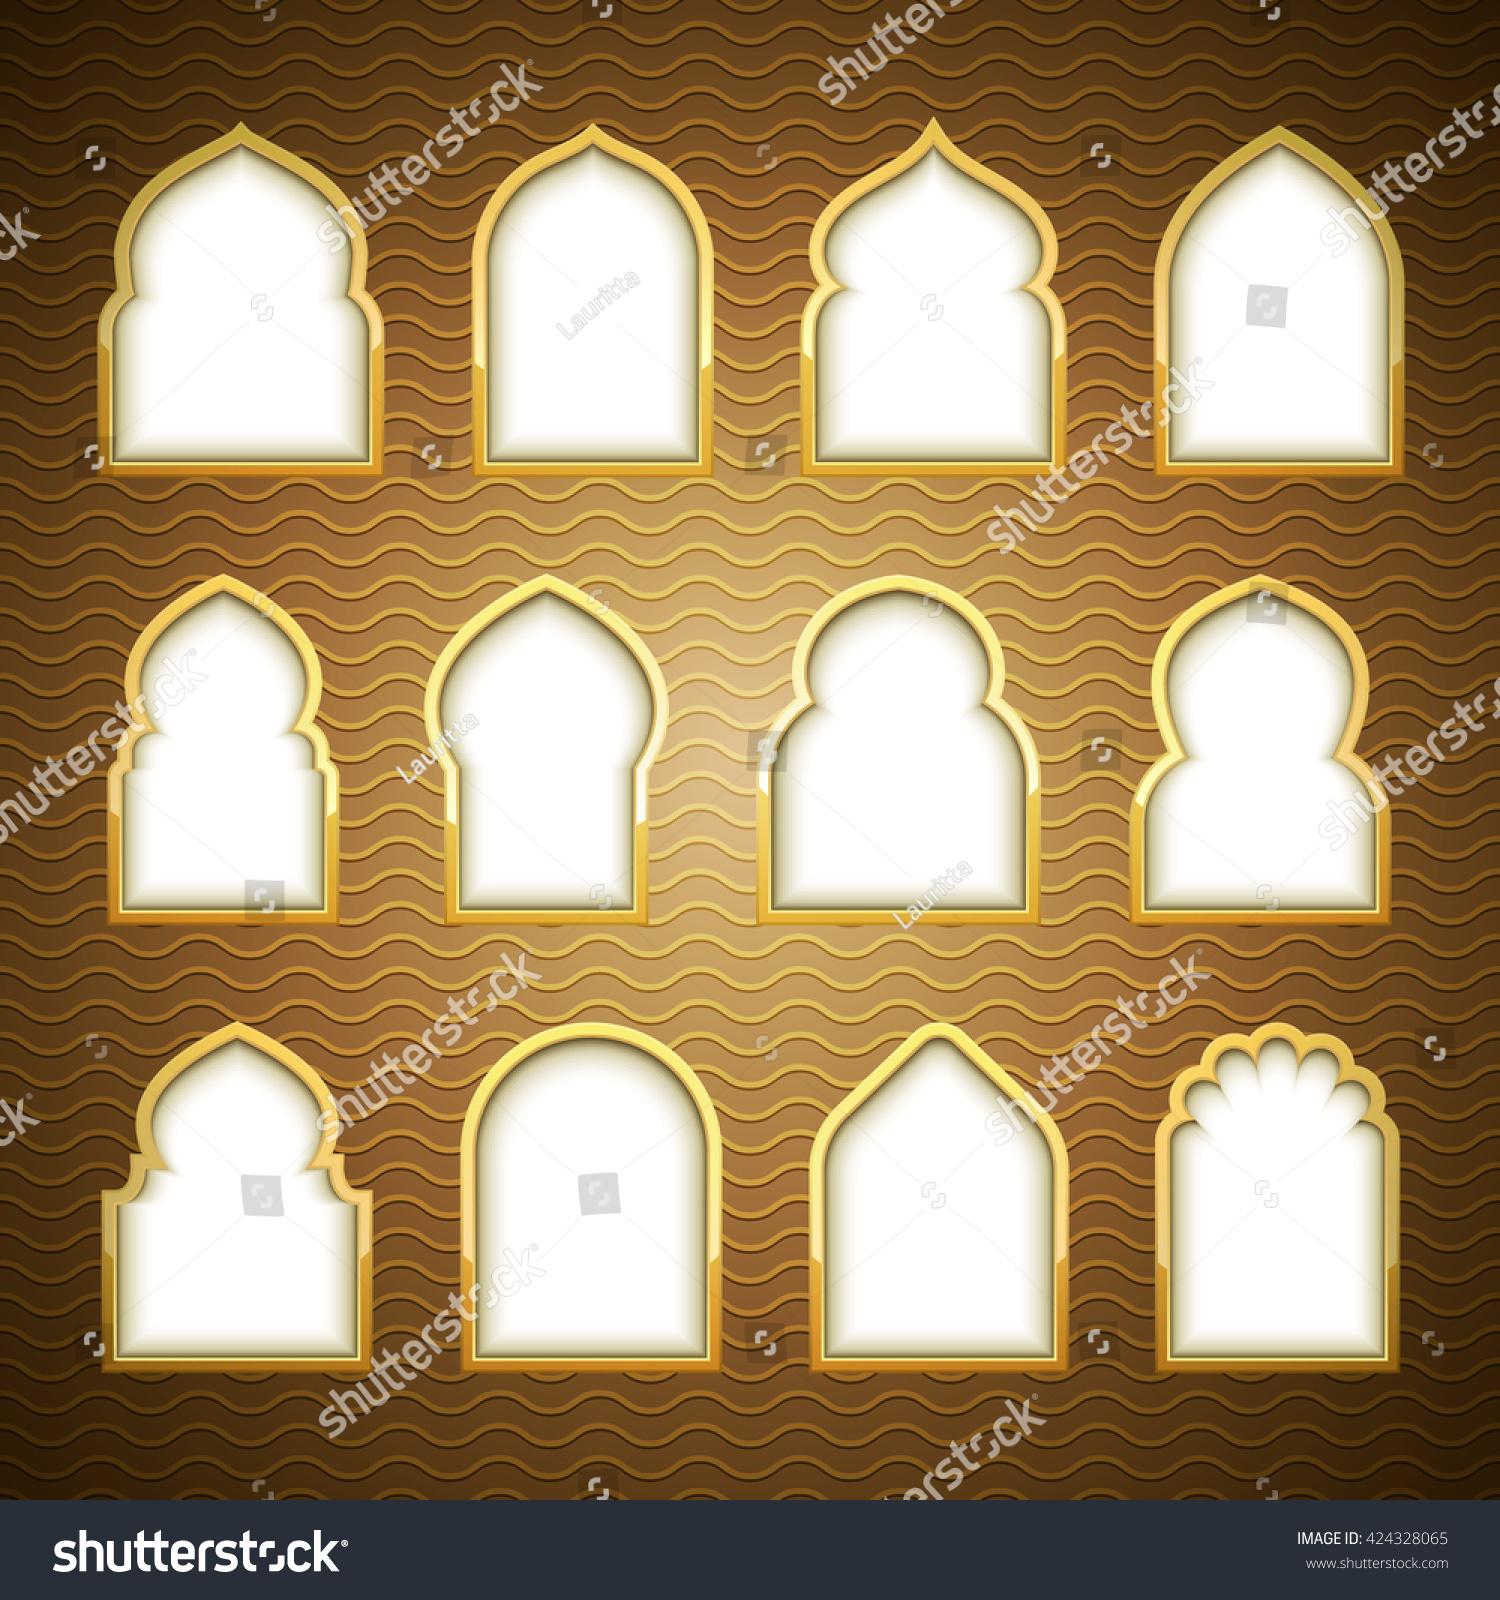 Gold design arab windows ramadan kareem stock vector for Window design vector